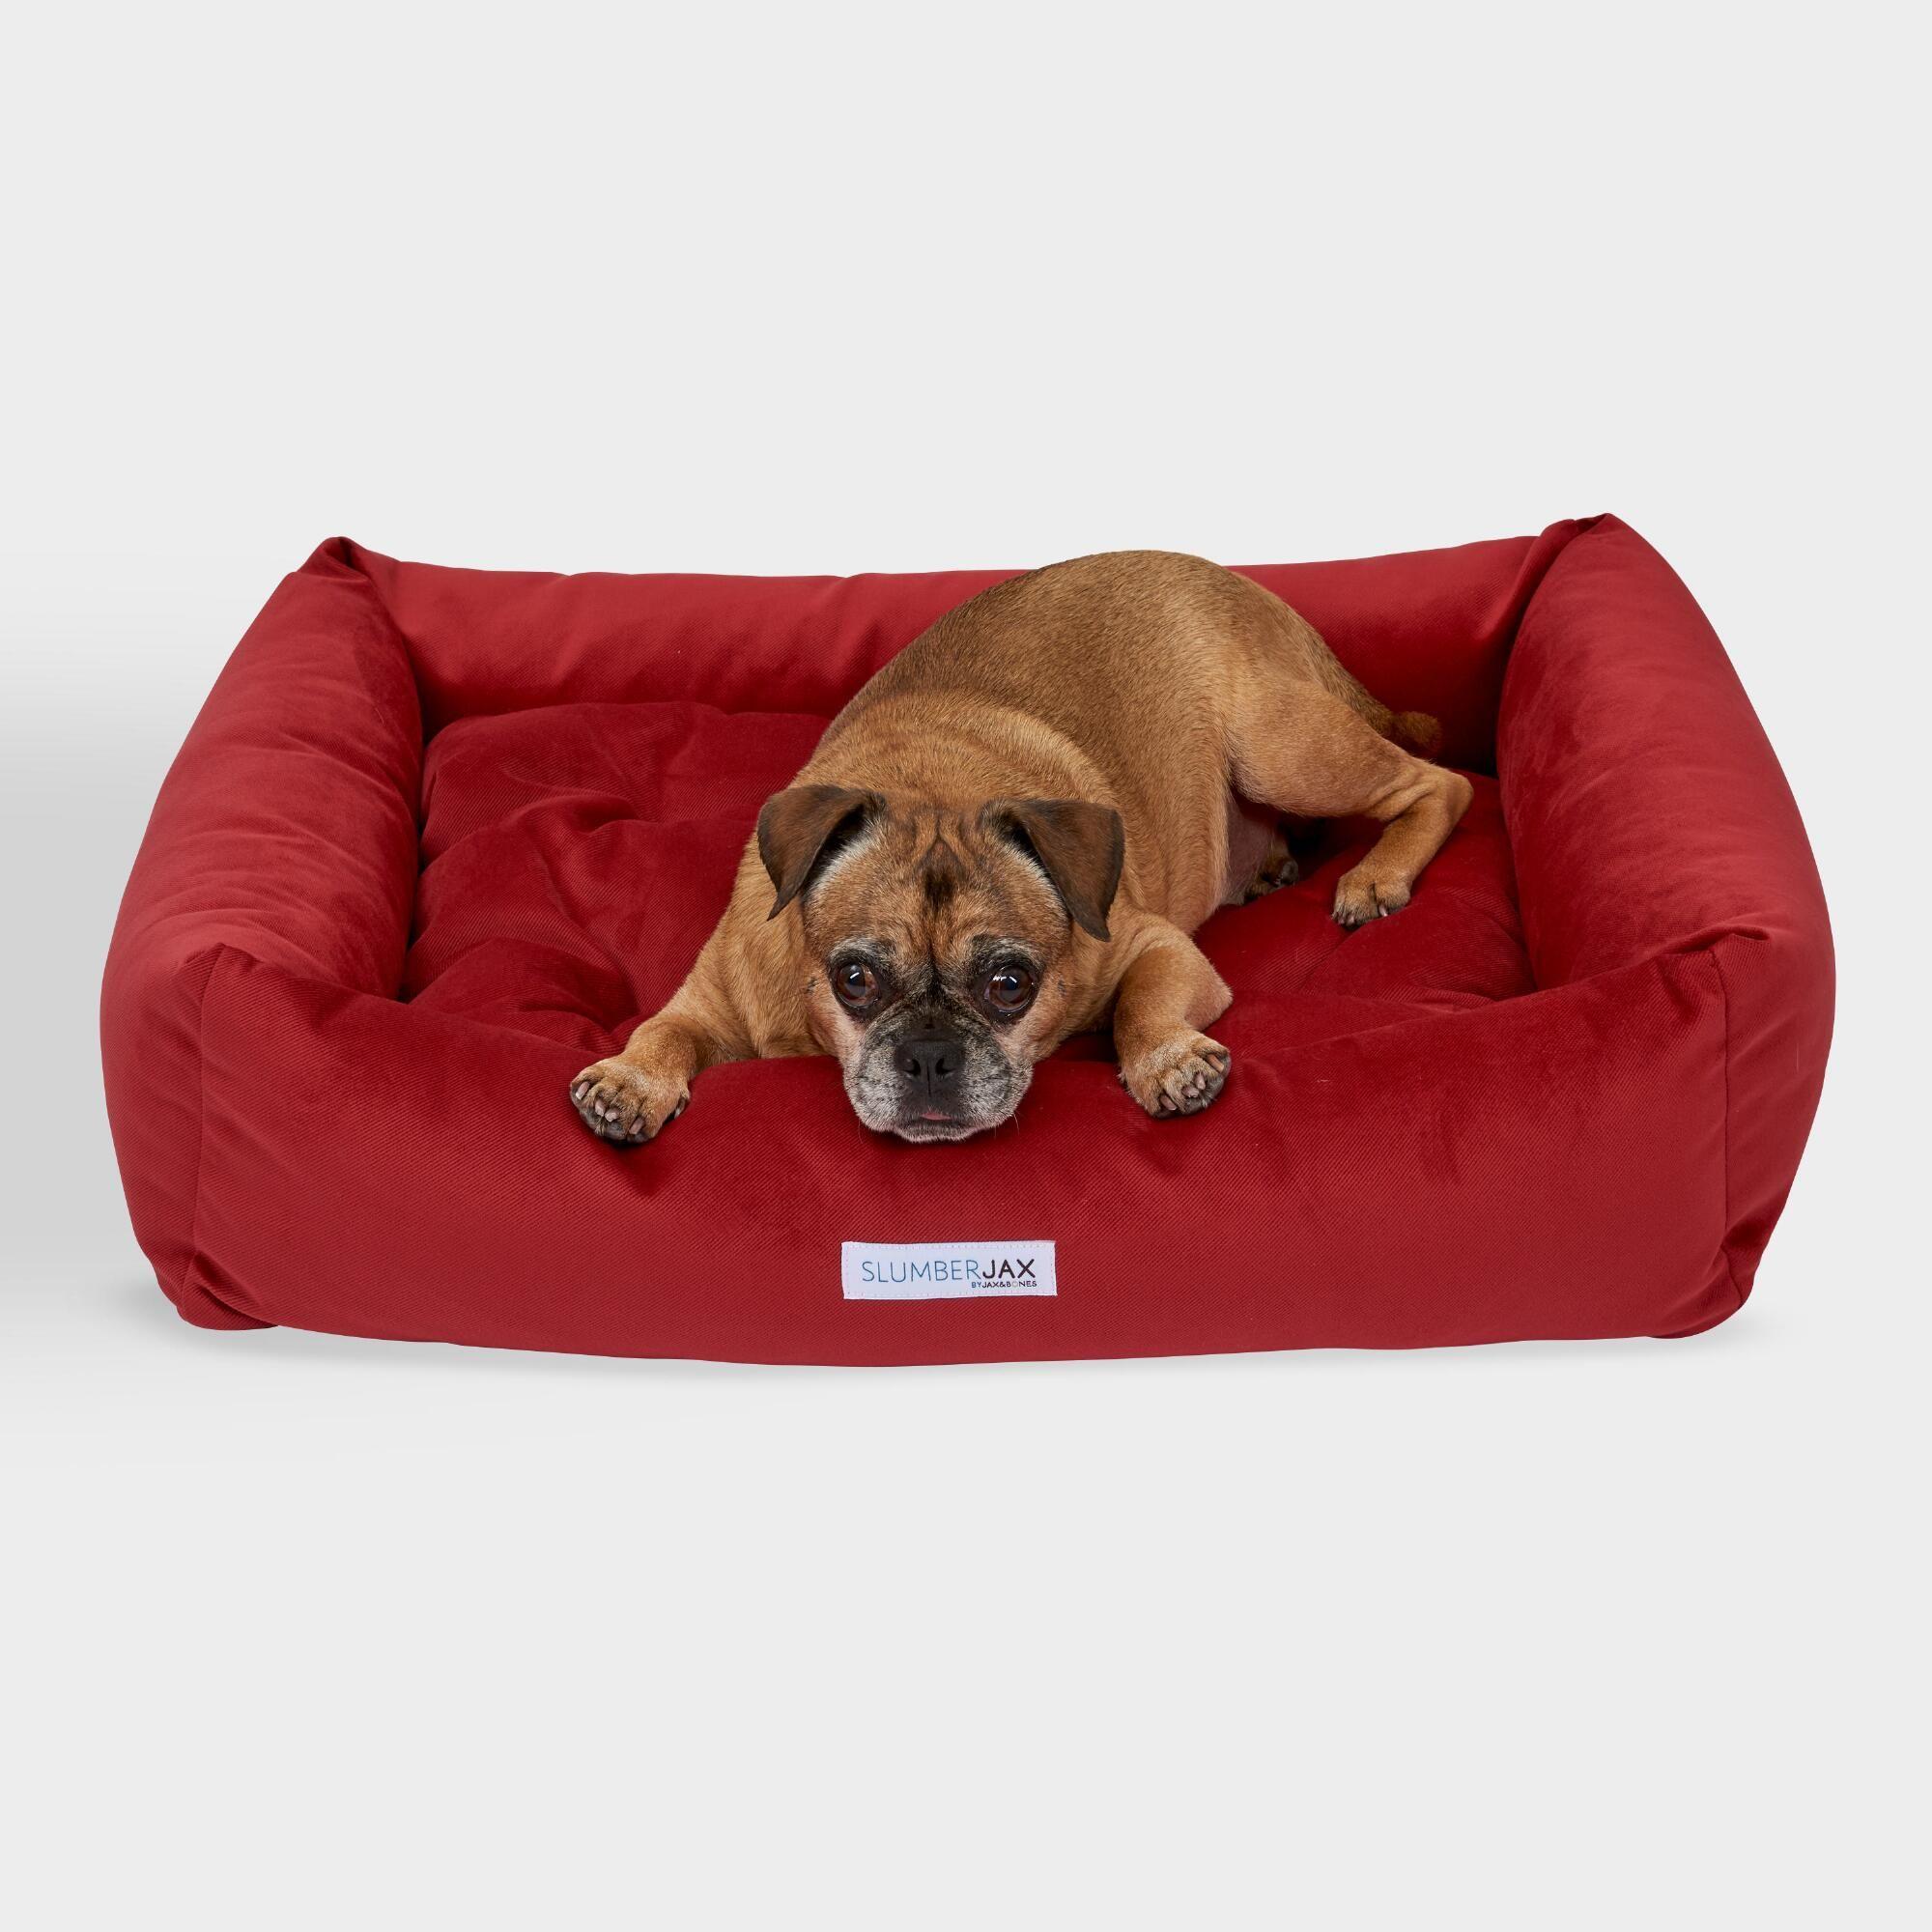 Medium Rectangular Red Velour Dog Bed Large By World Market